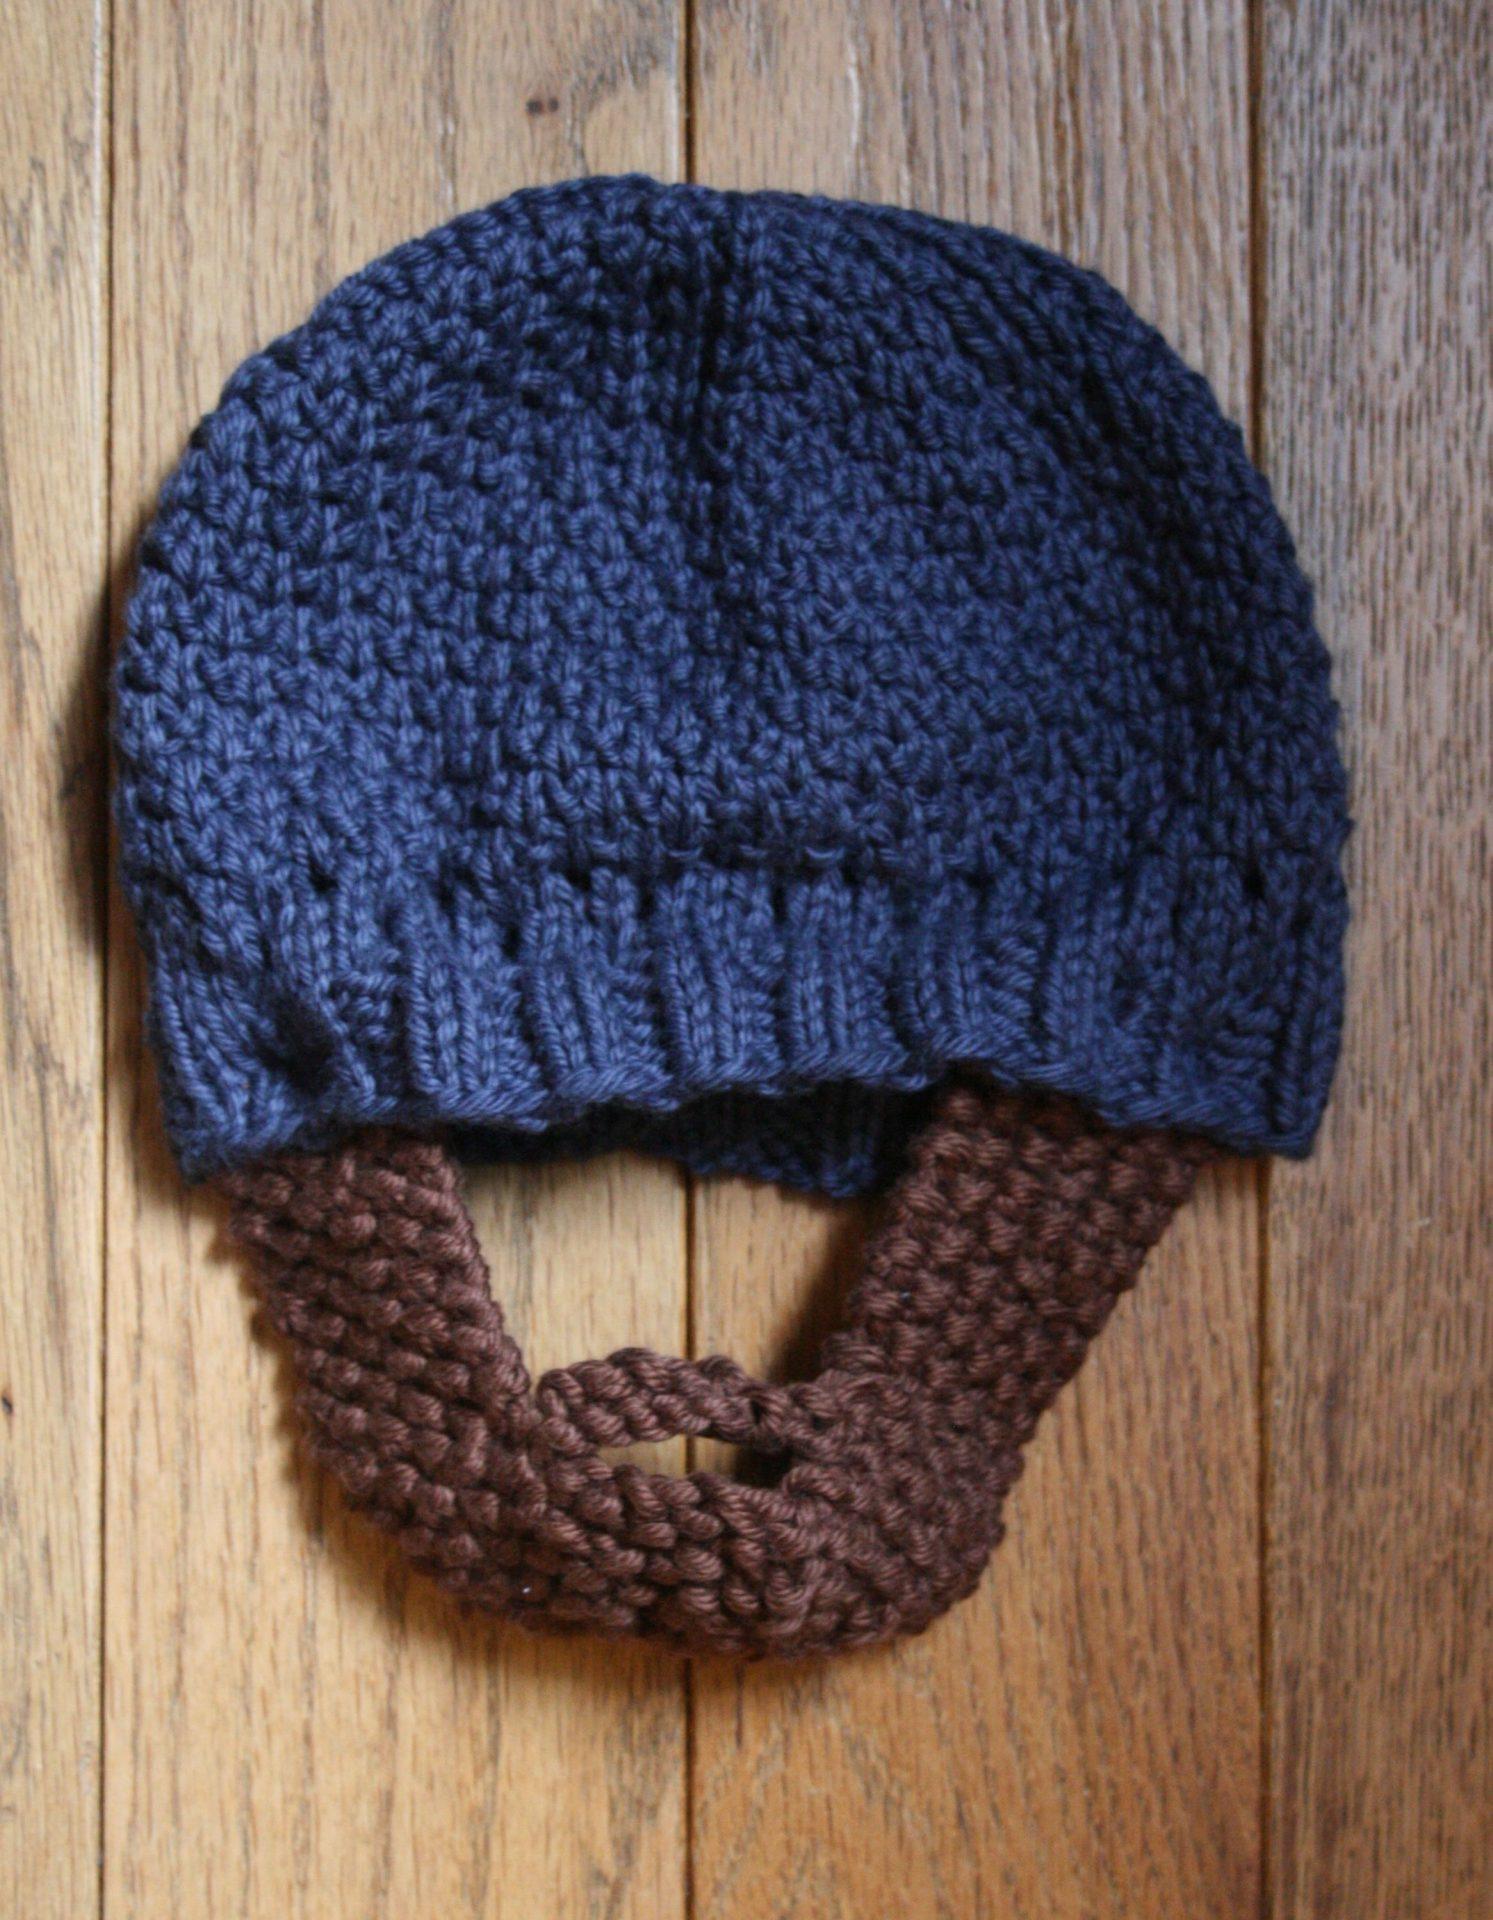 Old Fashioned Knit Beard Pattern Motif - Blanket Knitting Pattern ...